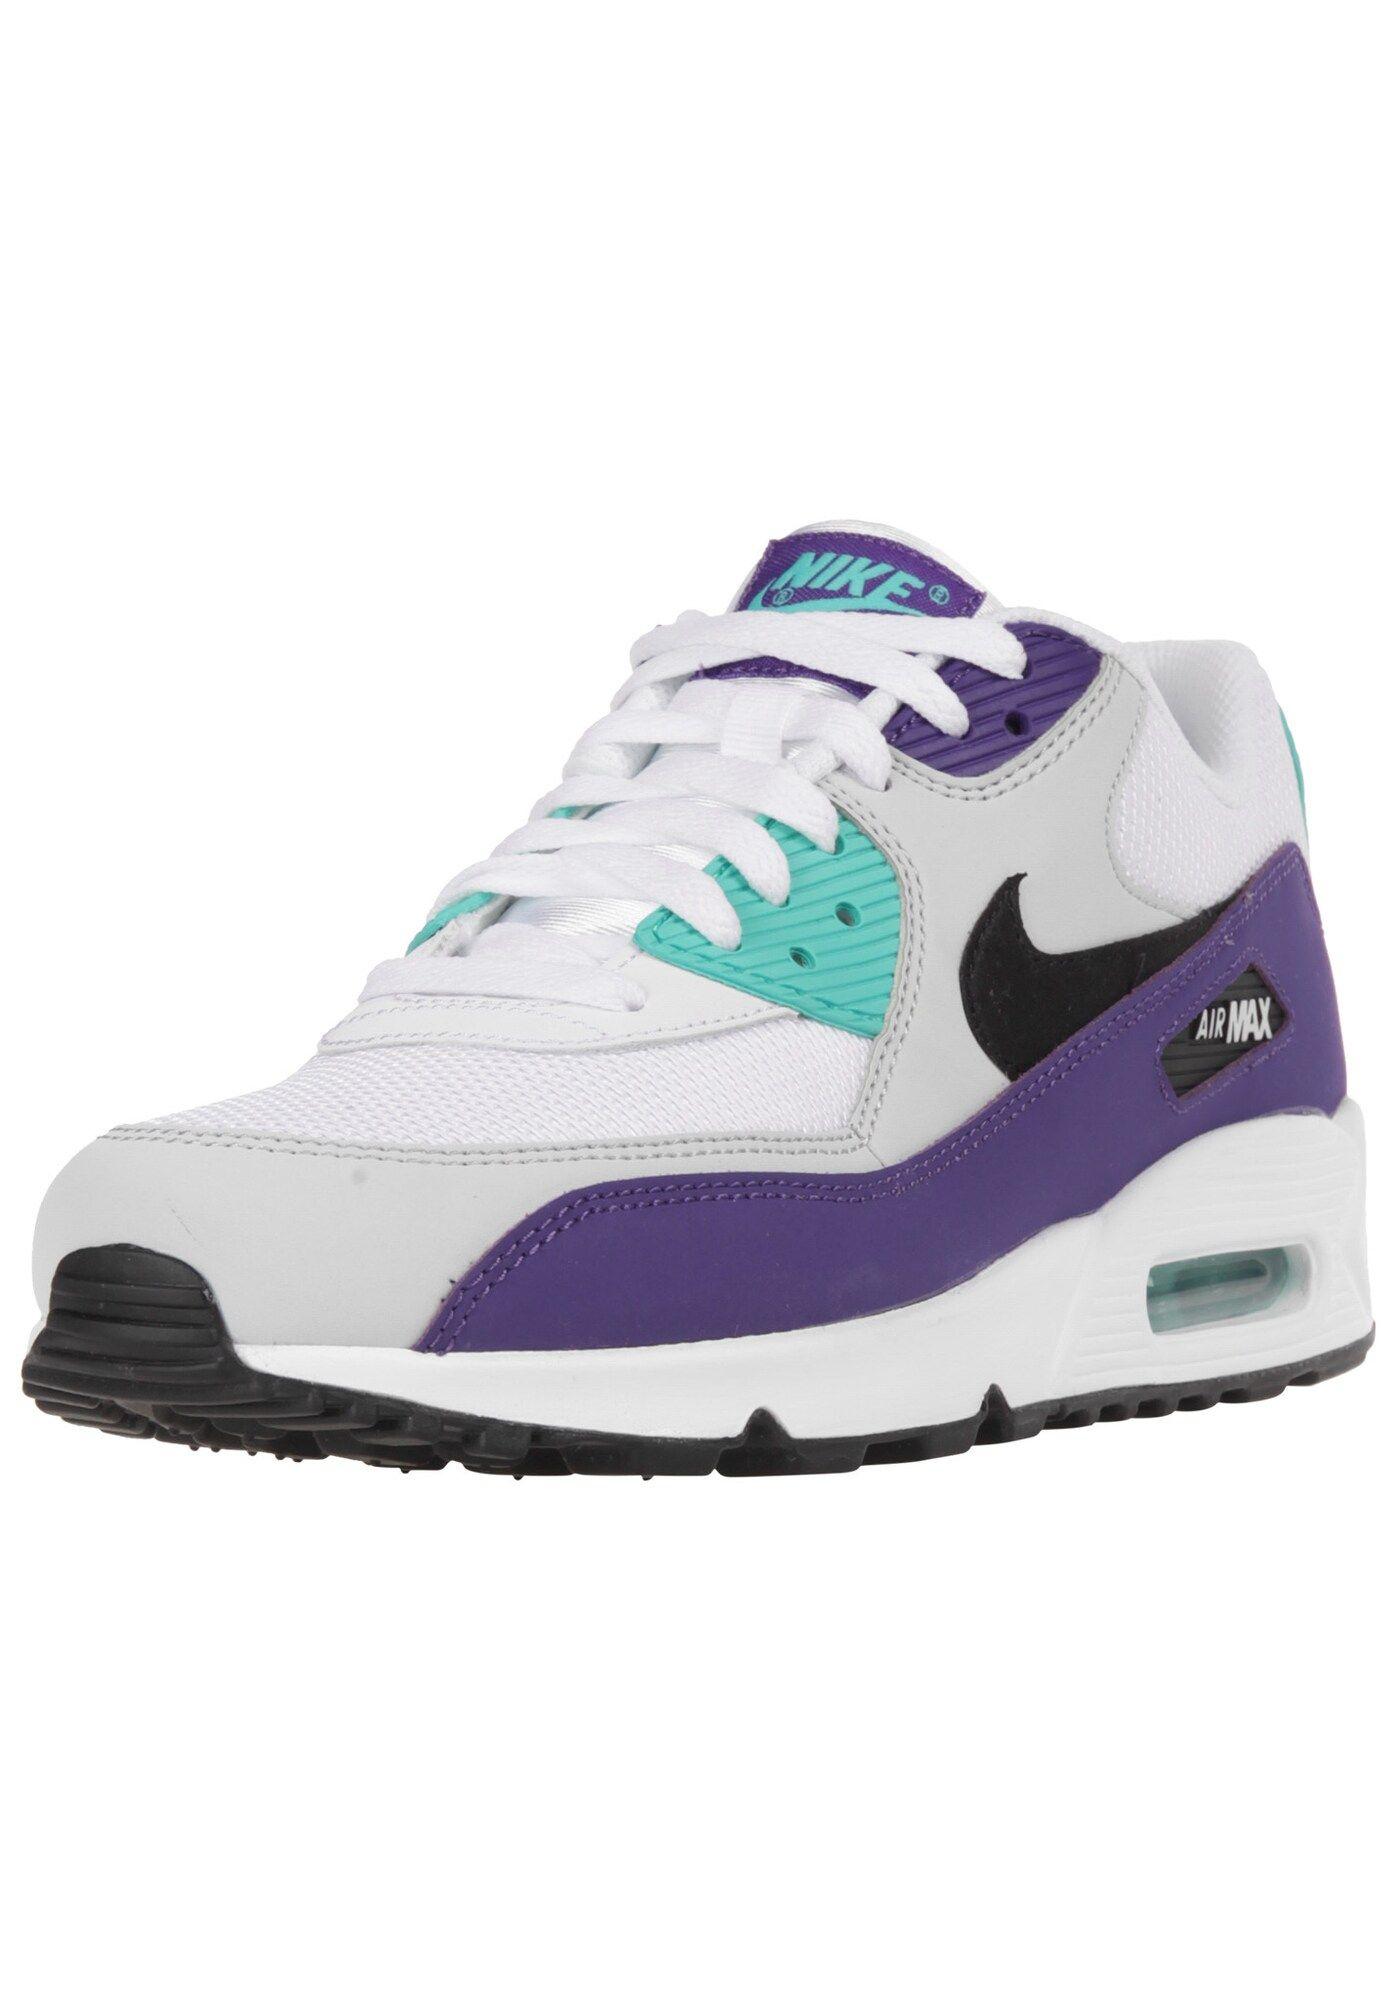 Nike Sportswear Sneaker Air Max 90 Essential Herren Turkis Mauve Schwarz Weiss Grosse 47 5 Nike Sportswear Nike Und Air Max 90